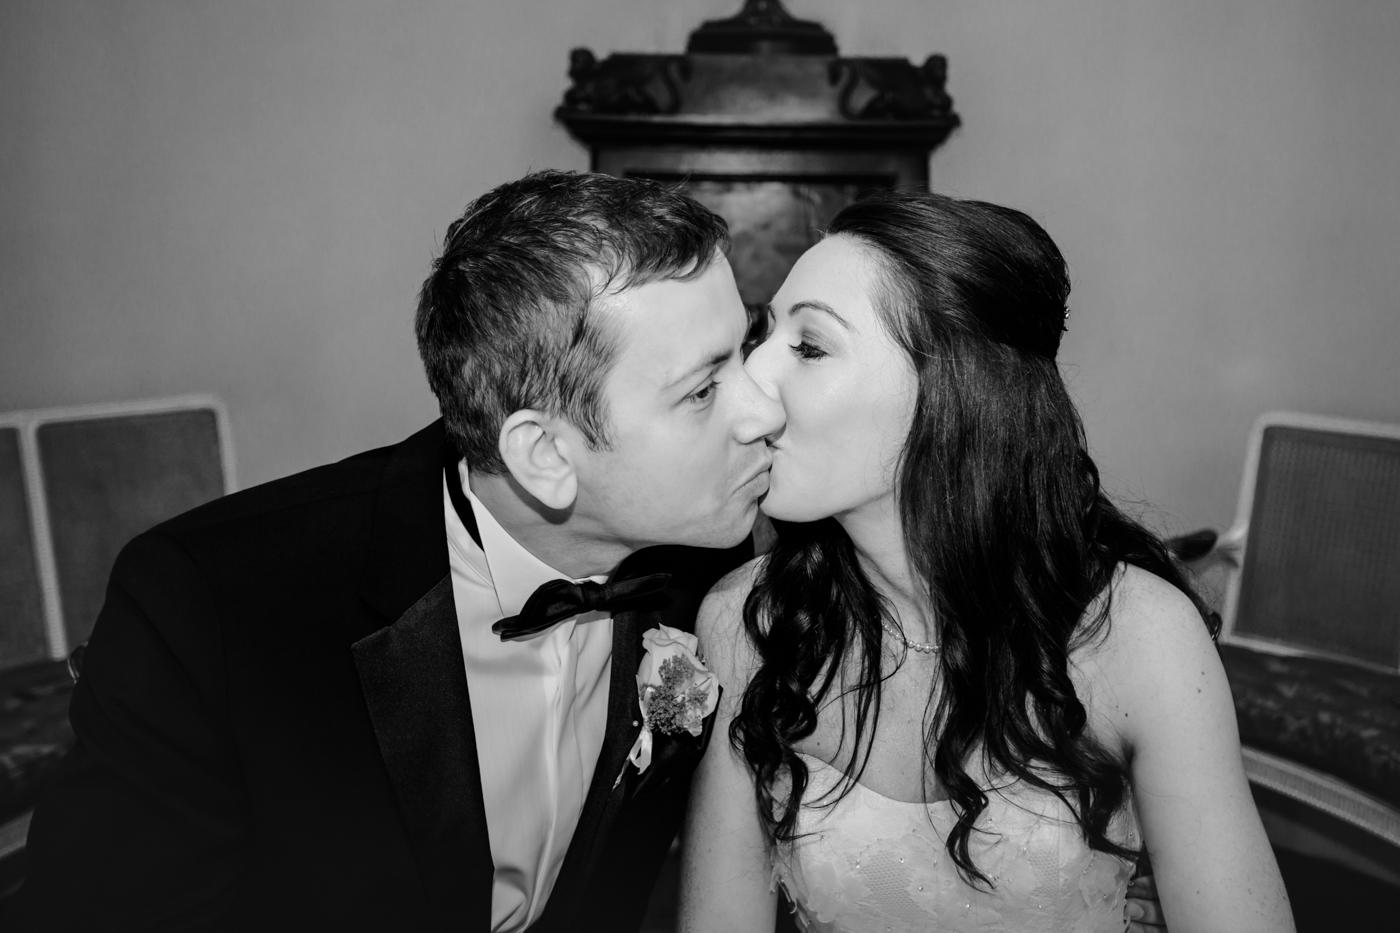 074 - Abi and Chris at Kedleston Hall - Wedding Photography by Mark Pugh www.markpugh.com - 0220.JPG